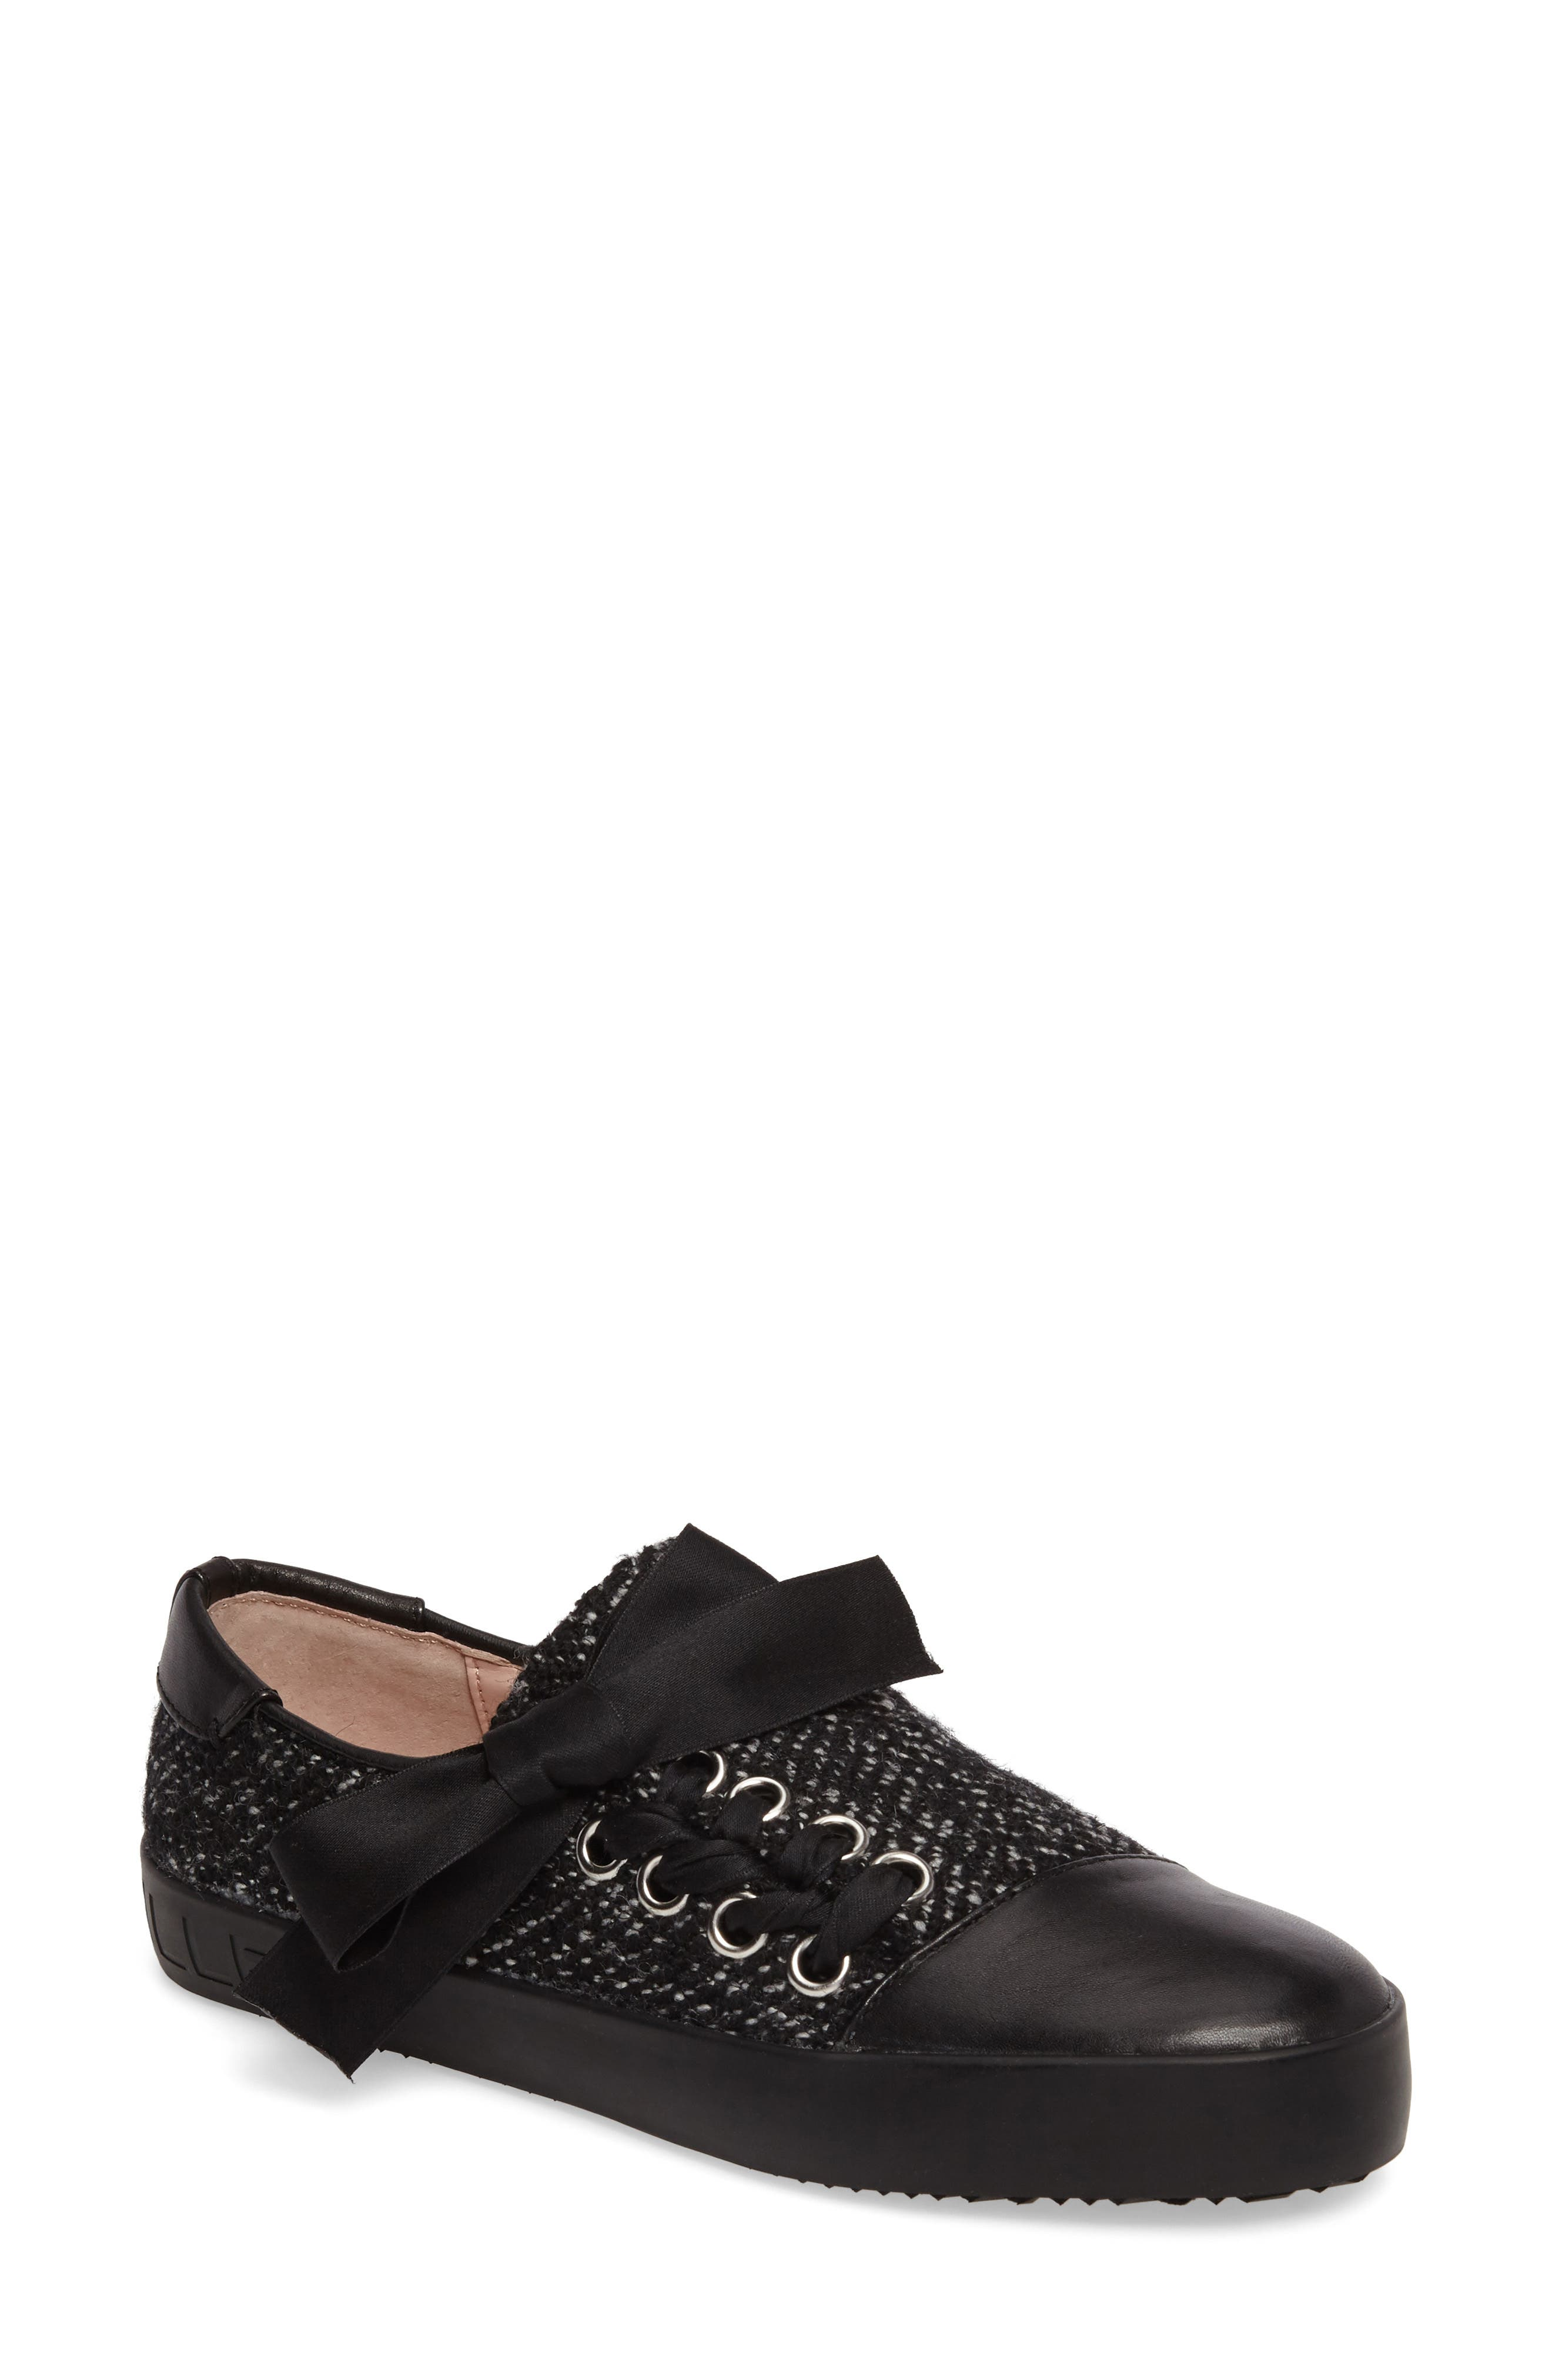 Vera Sneaker,                         Main,                         color, 001